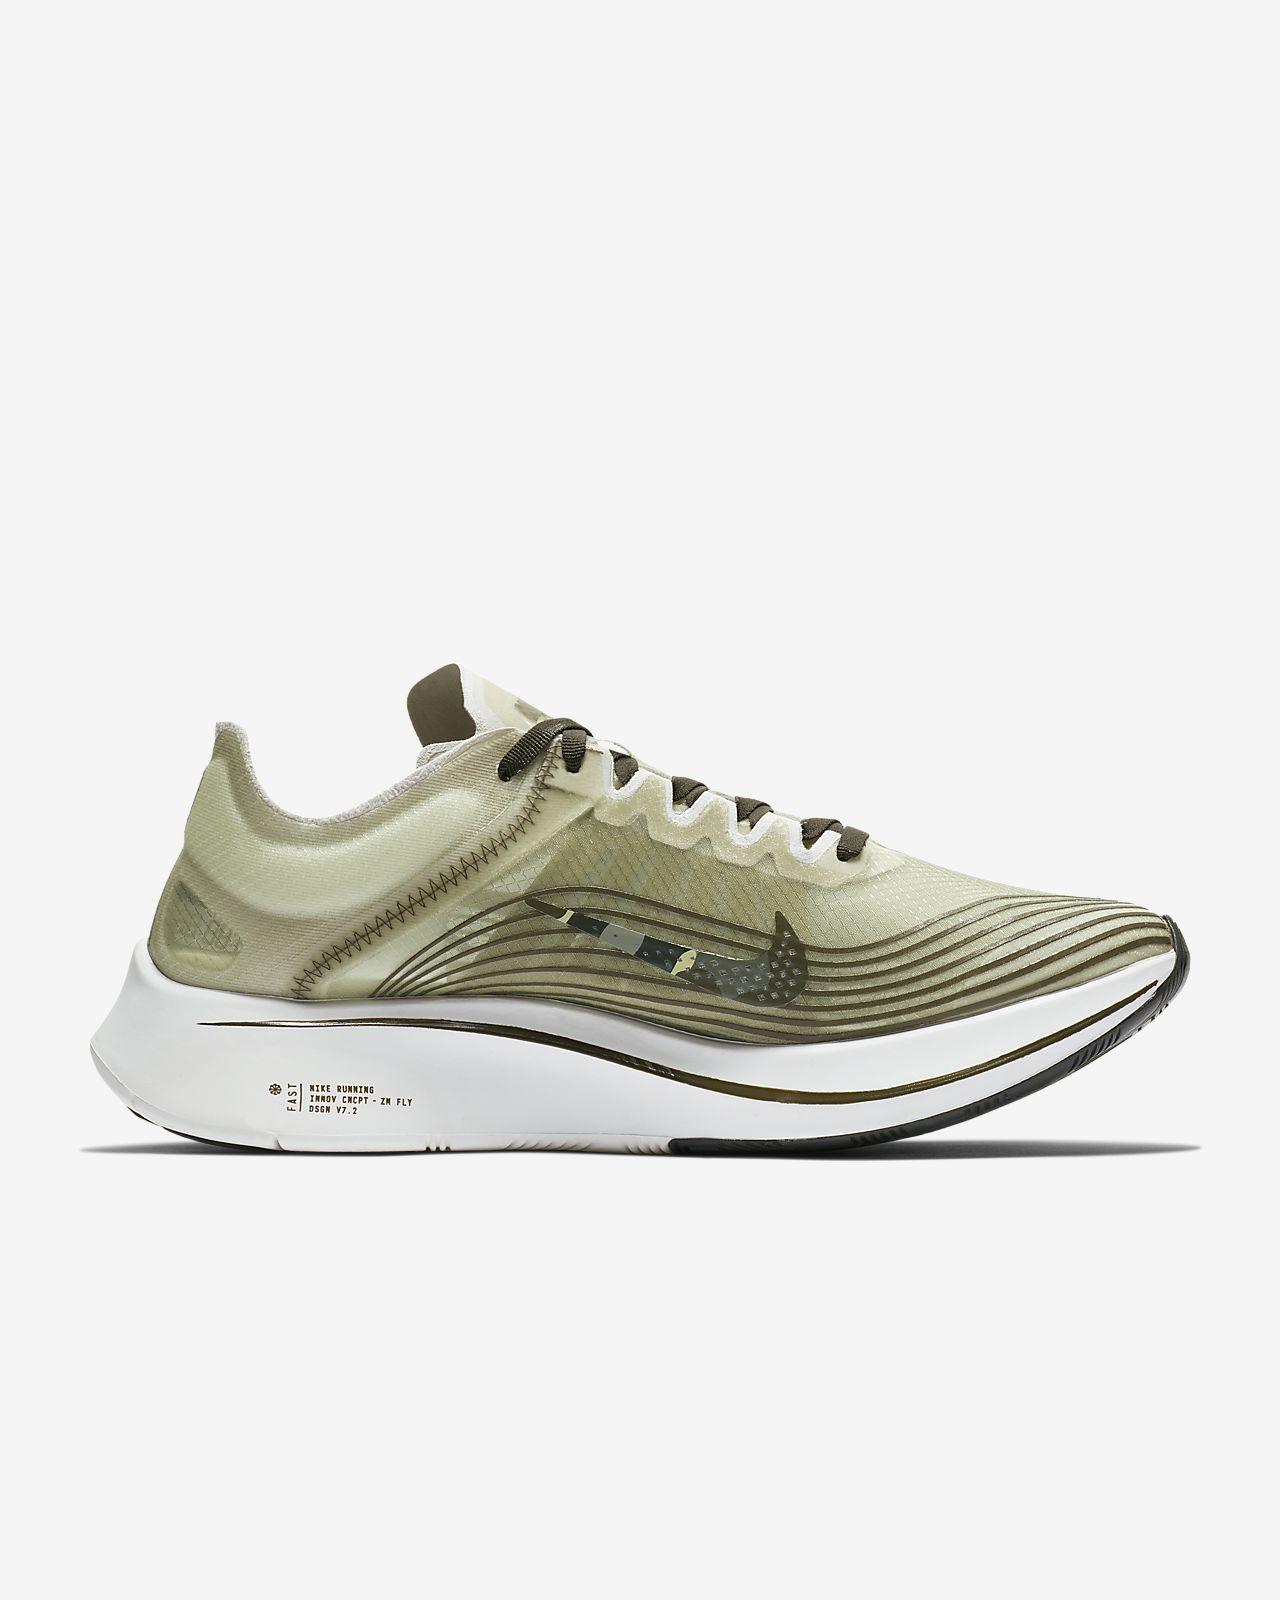 5e988a0237cd0 Nike Zoom Fly SP Men s Running Shoe. Nike.com